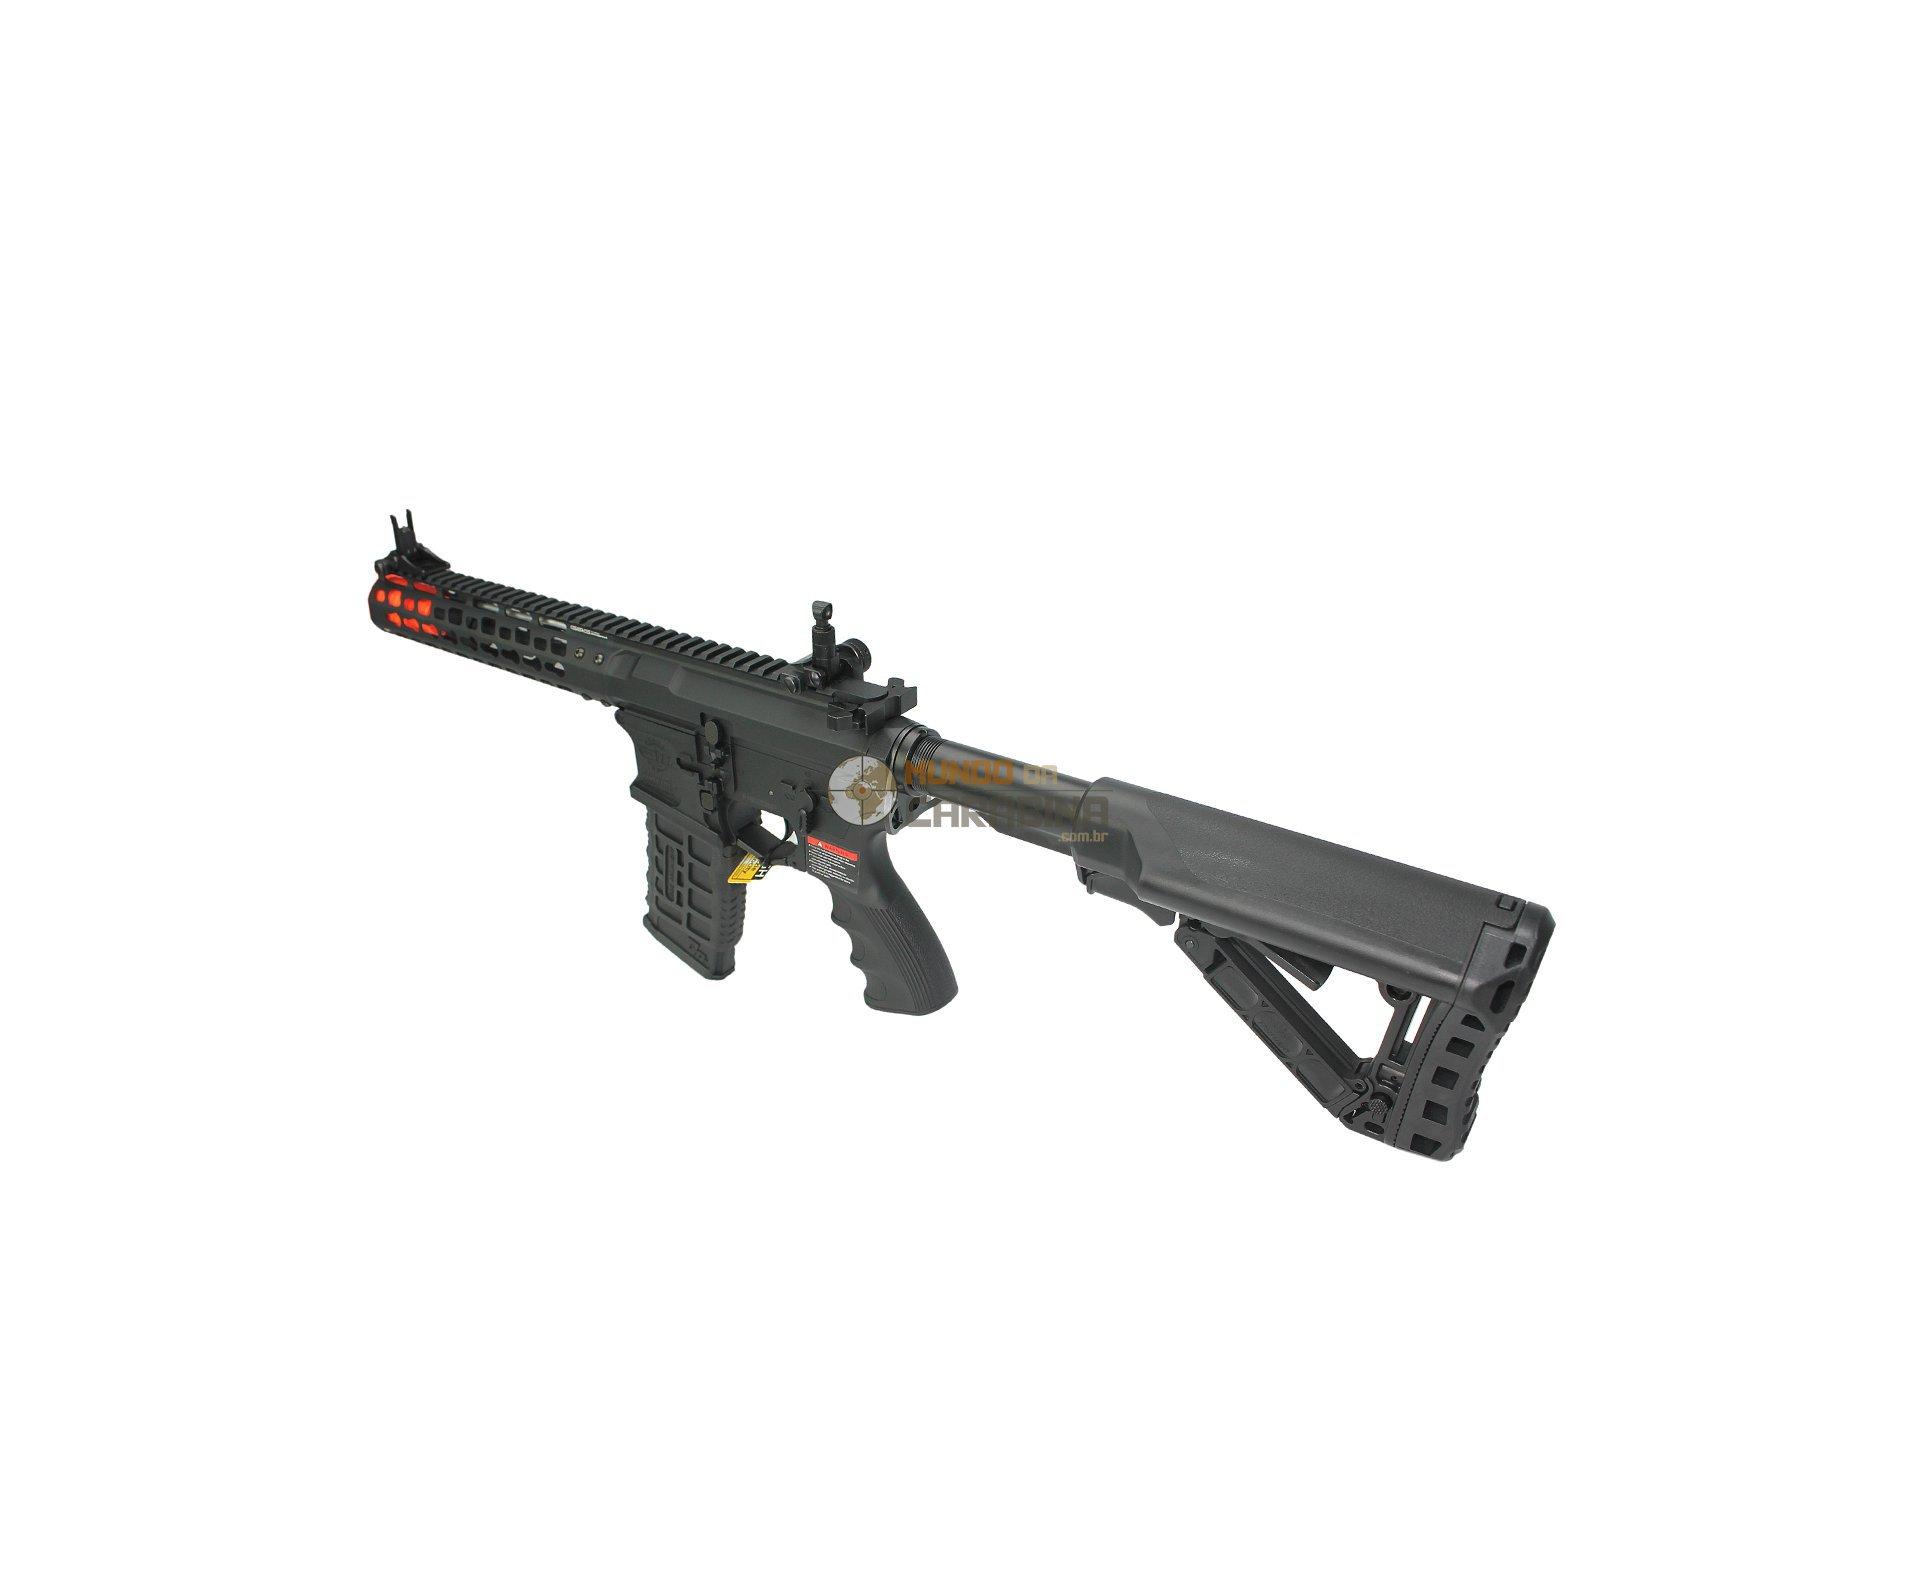 "Rifle De Airsoft Cm16 Wild Hog 9"" Elet Mosfet- Cal 6mm - G&g"